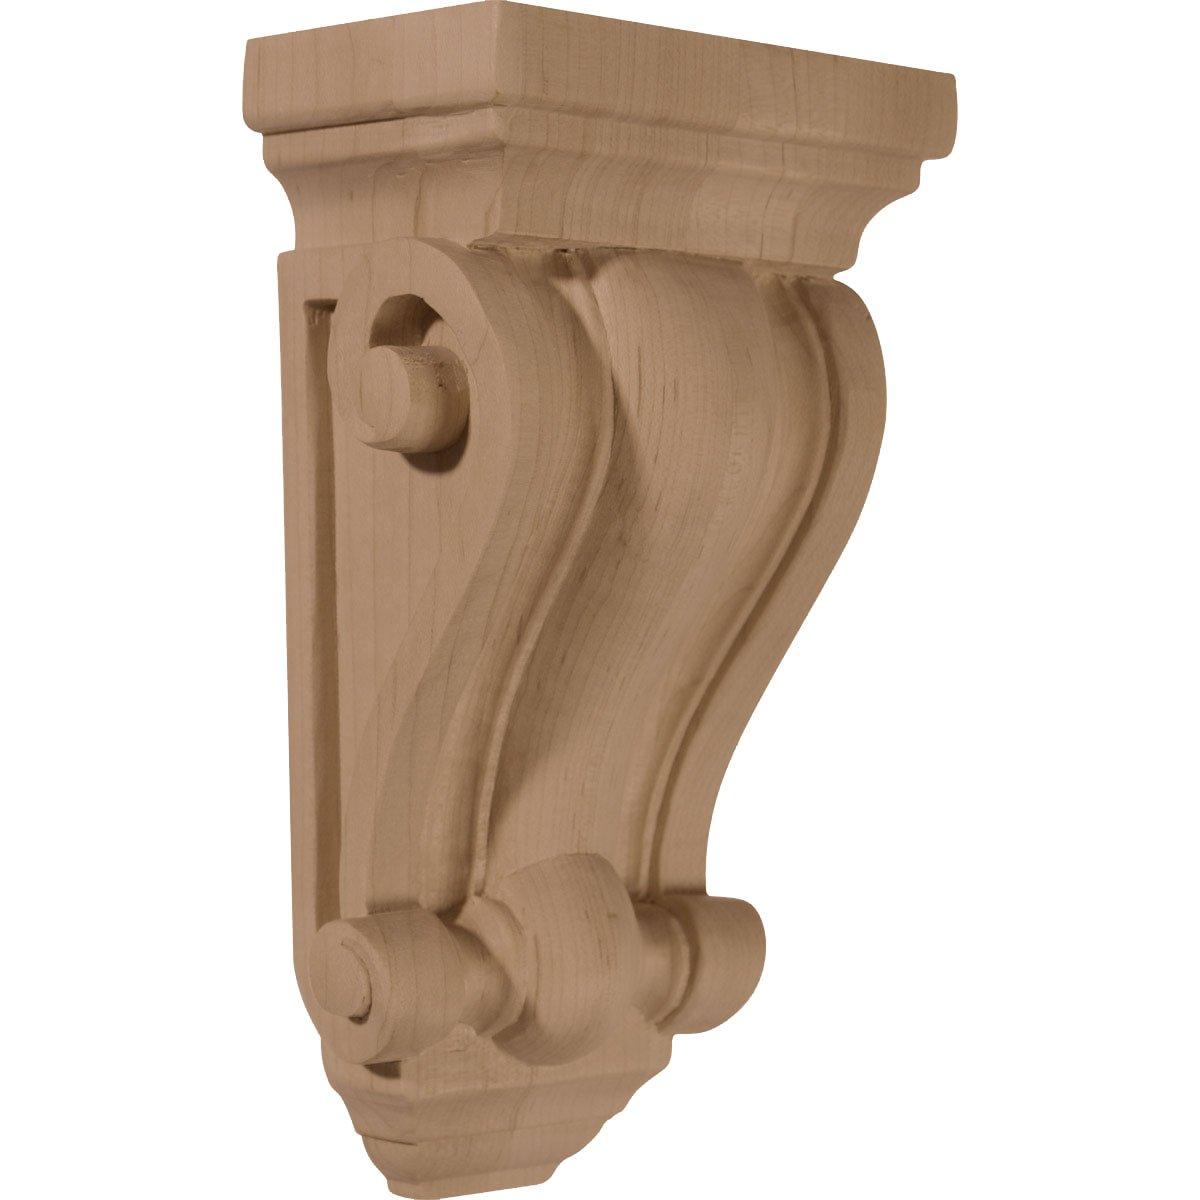 Ekena Millwork CORW04X02X07COMA 4-Inch W x 2 1/2-Inch D x 7 1/2-Inch H Cole Pilaster Wood Corbel, Maple